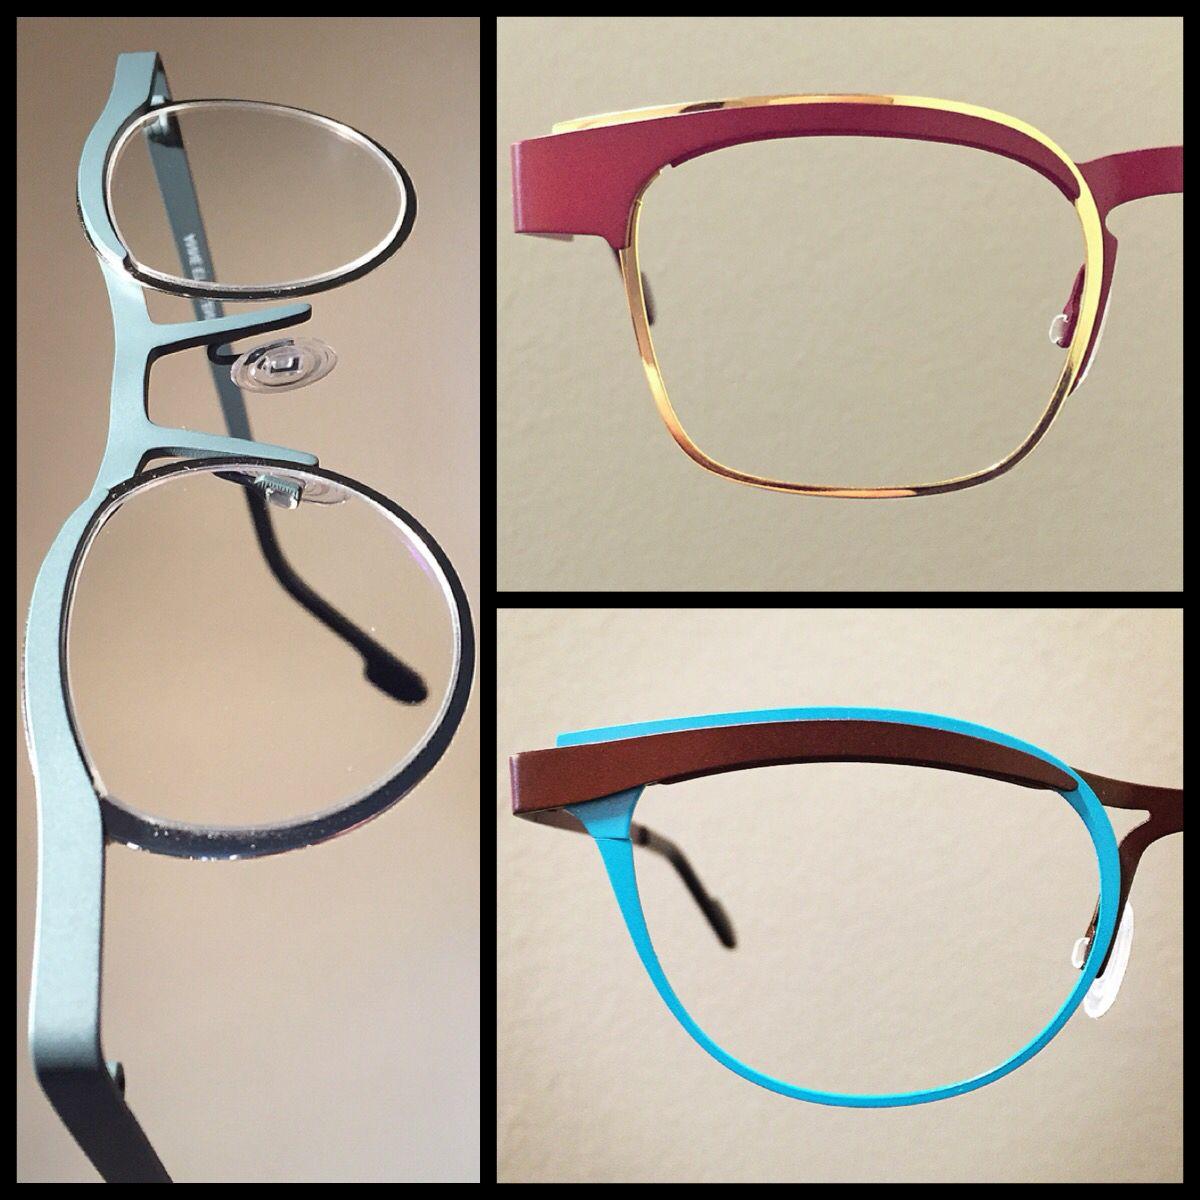 Anne et Valentin W series NOW AVAILABLE specsoptical